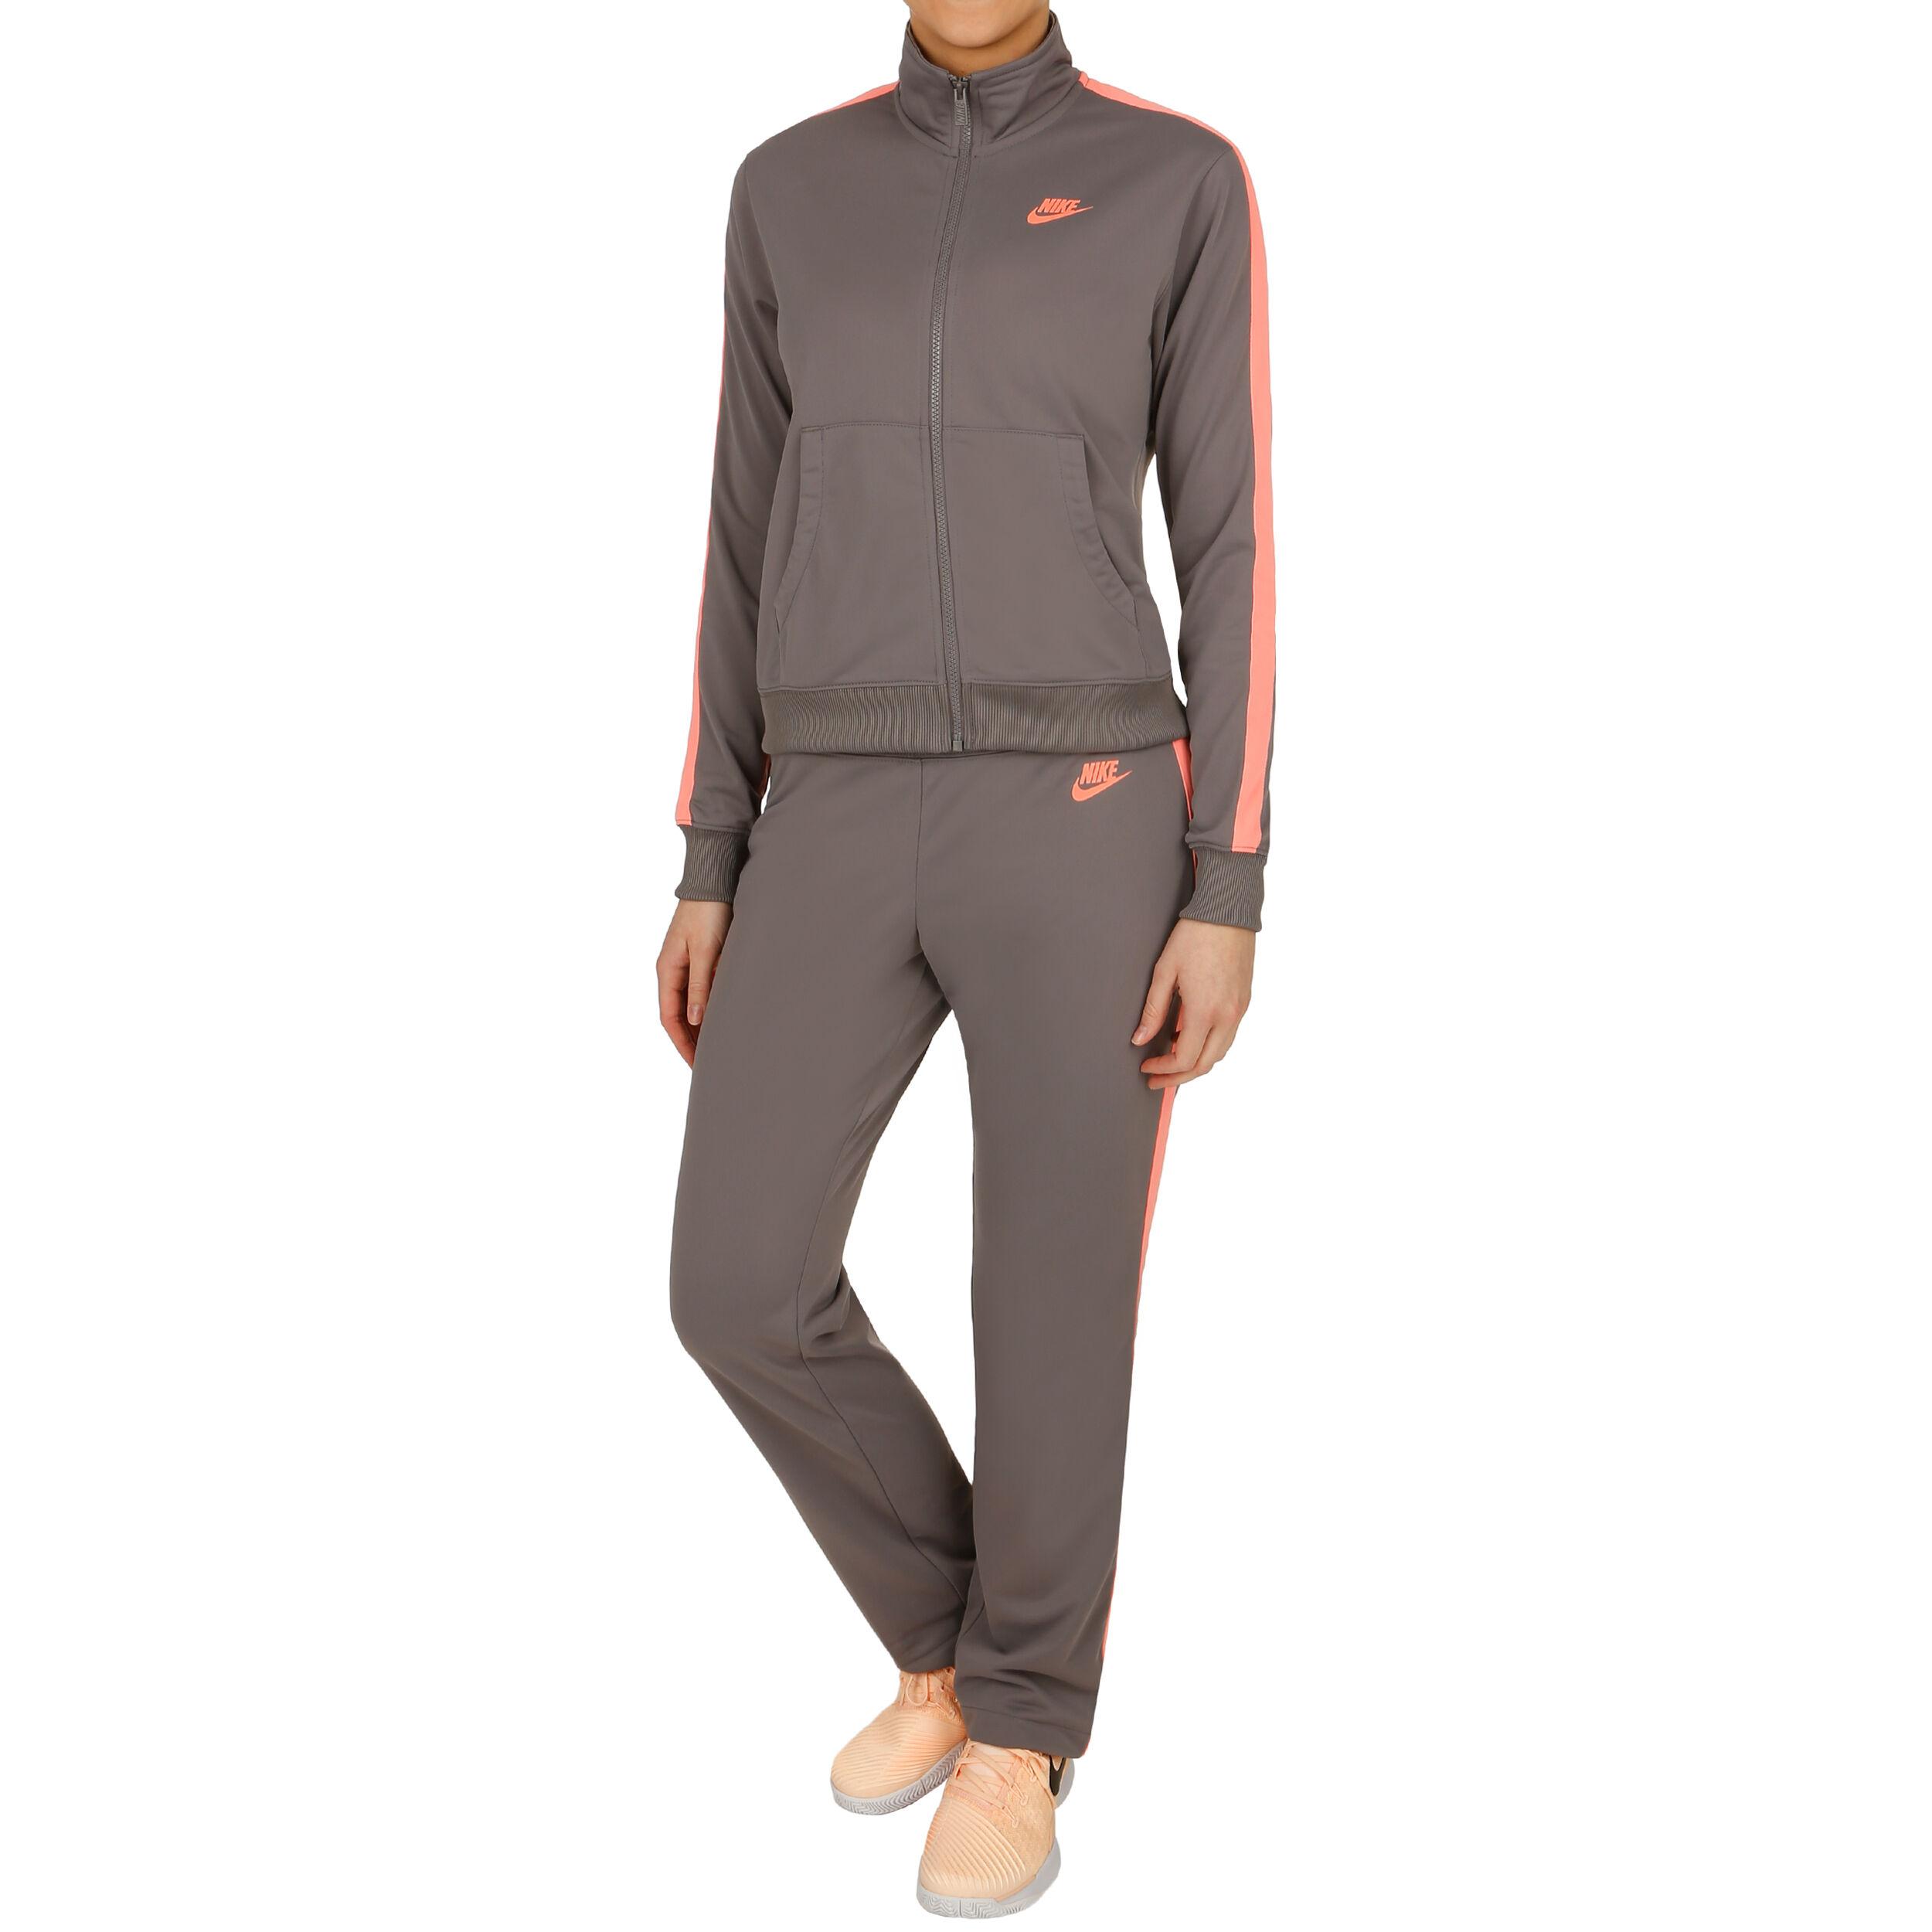 Nike Sportswear Trainingsanzug Damen - Dunkelgrau, Orange online ...